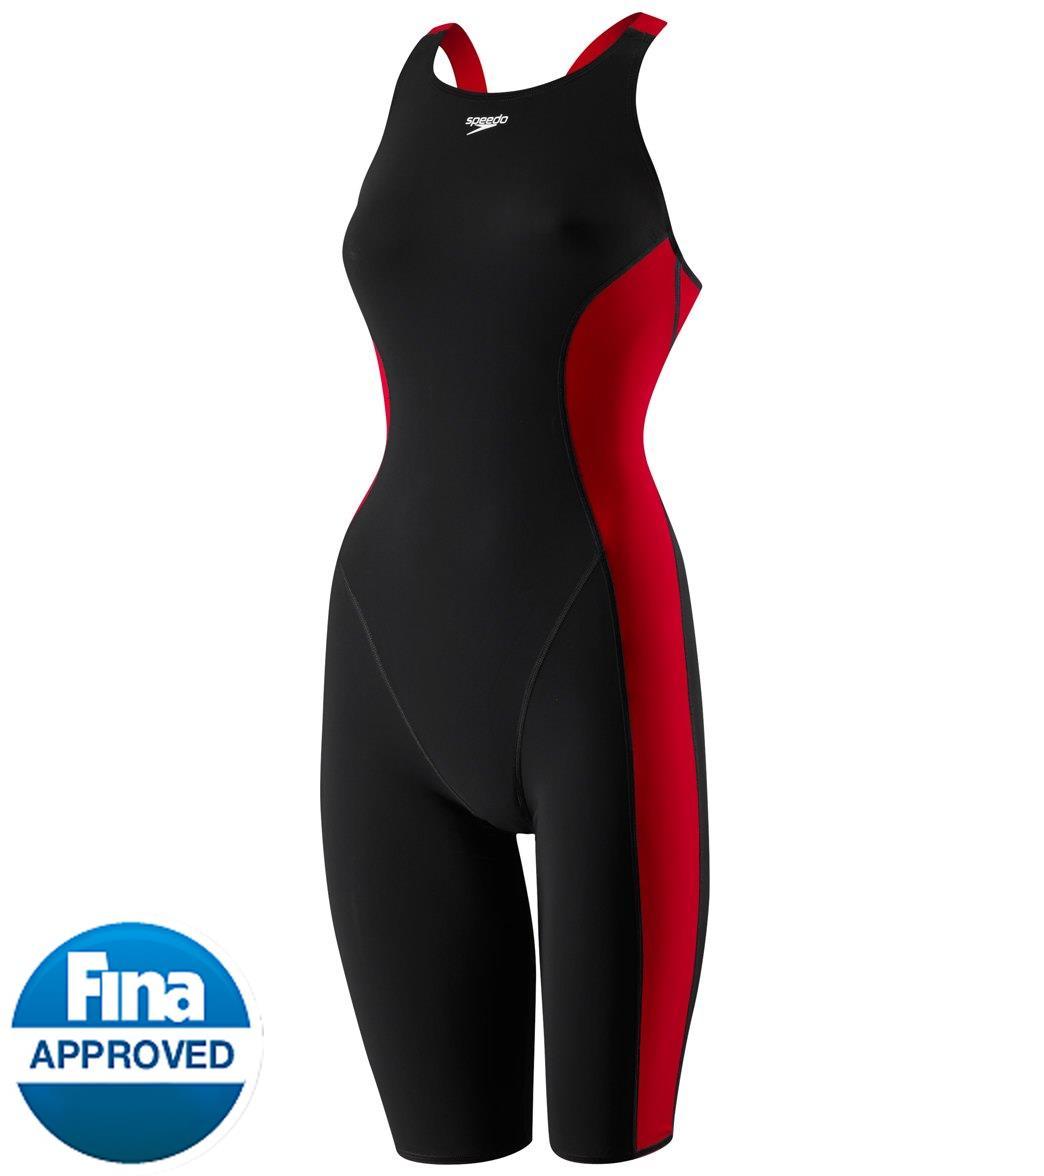 Speedo Women's Powerplus Kneeskin Tech Suit Swimsuit at